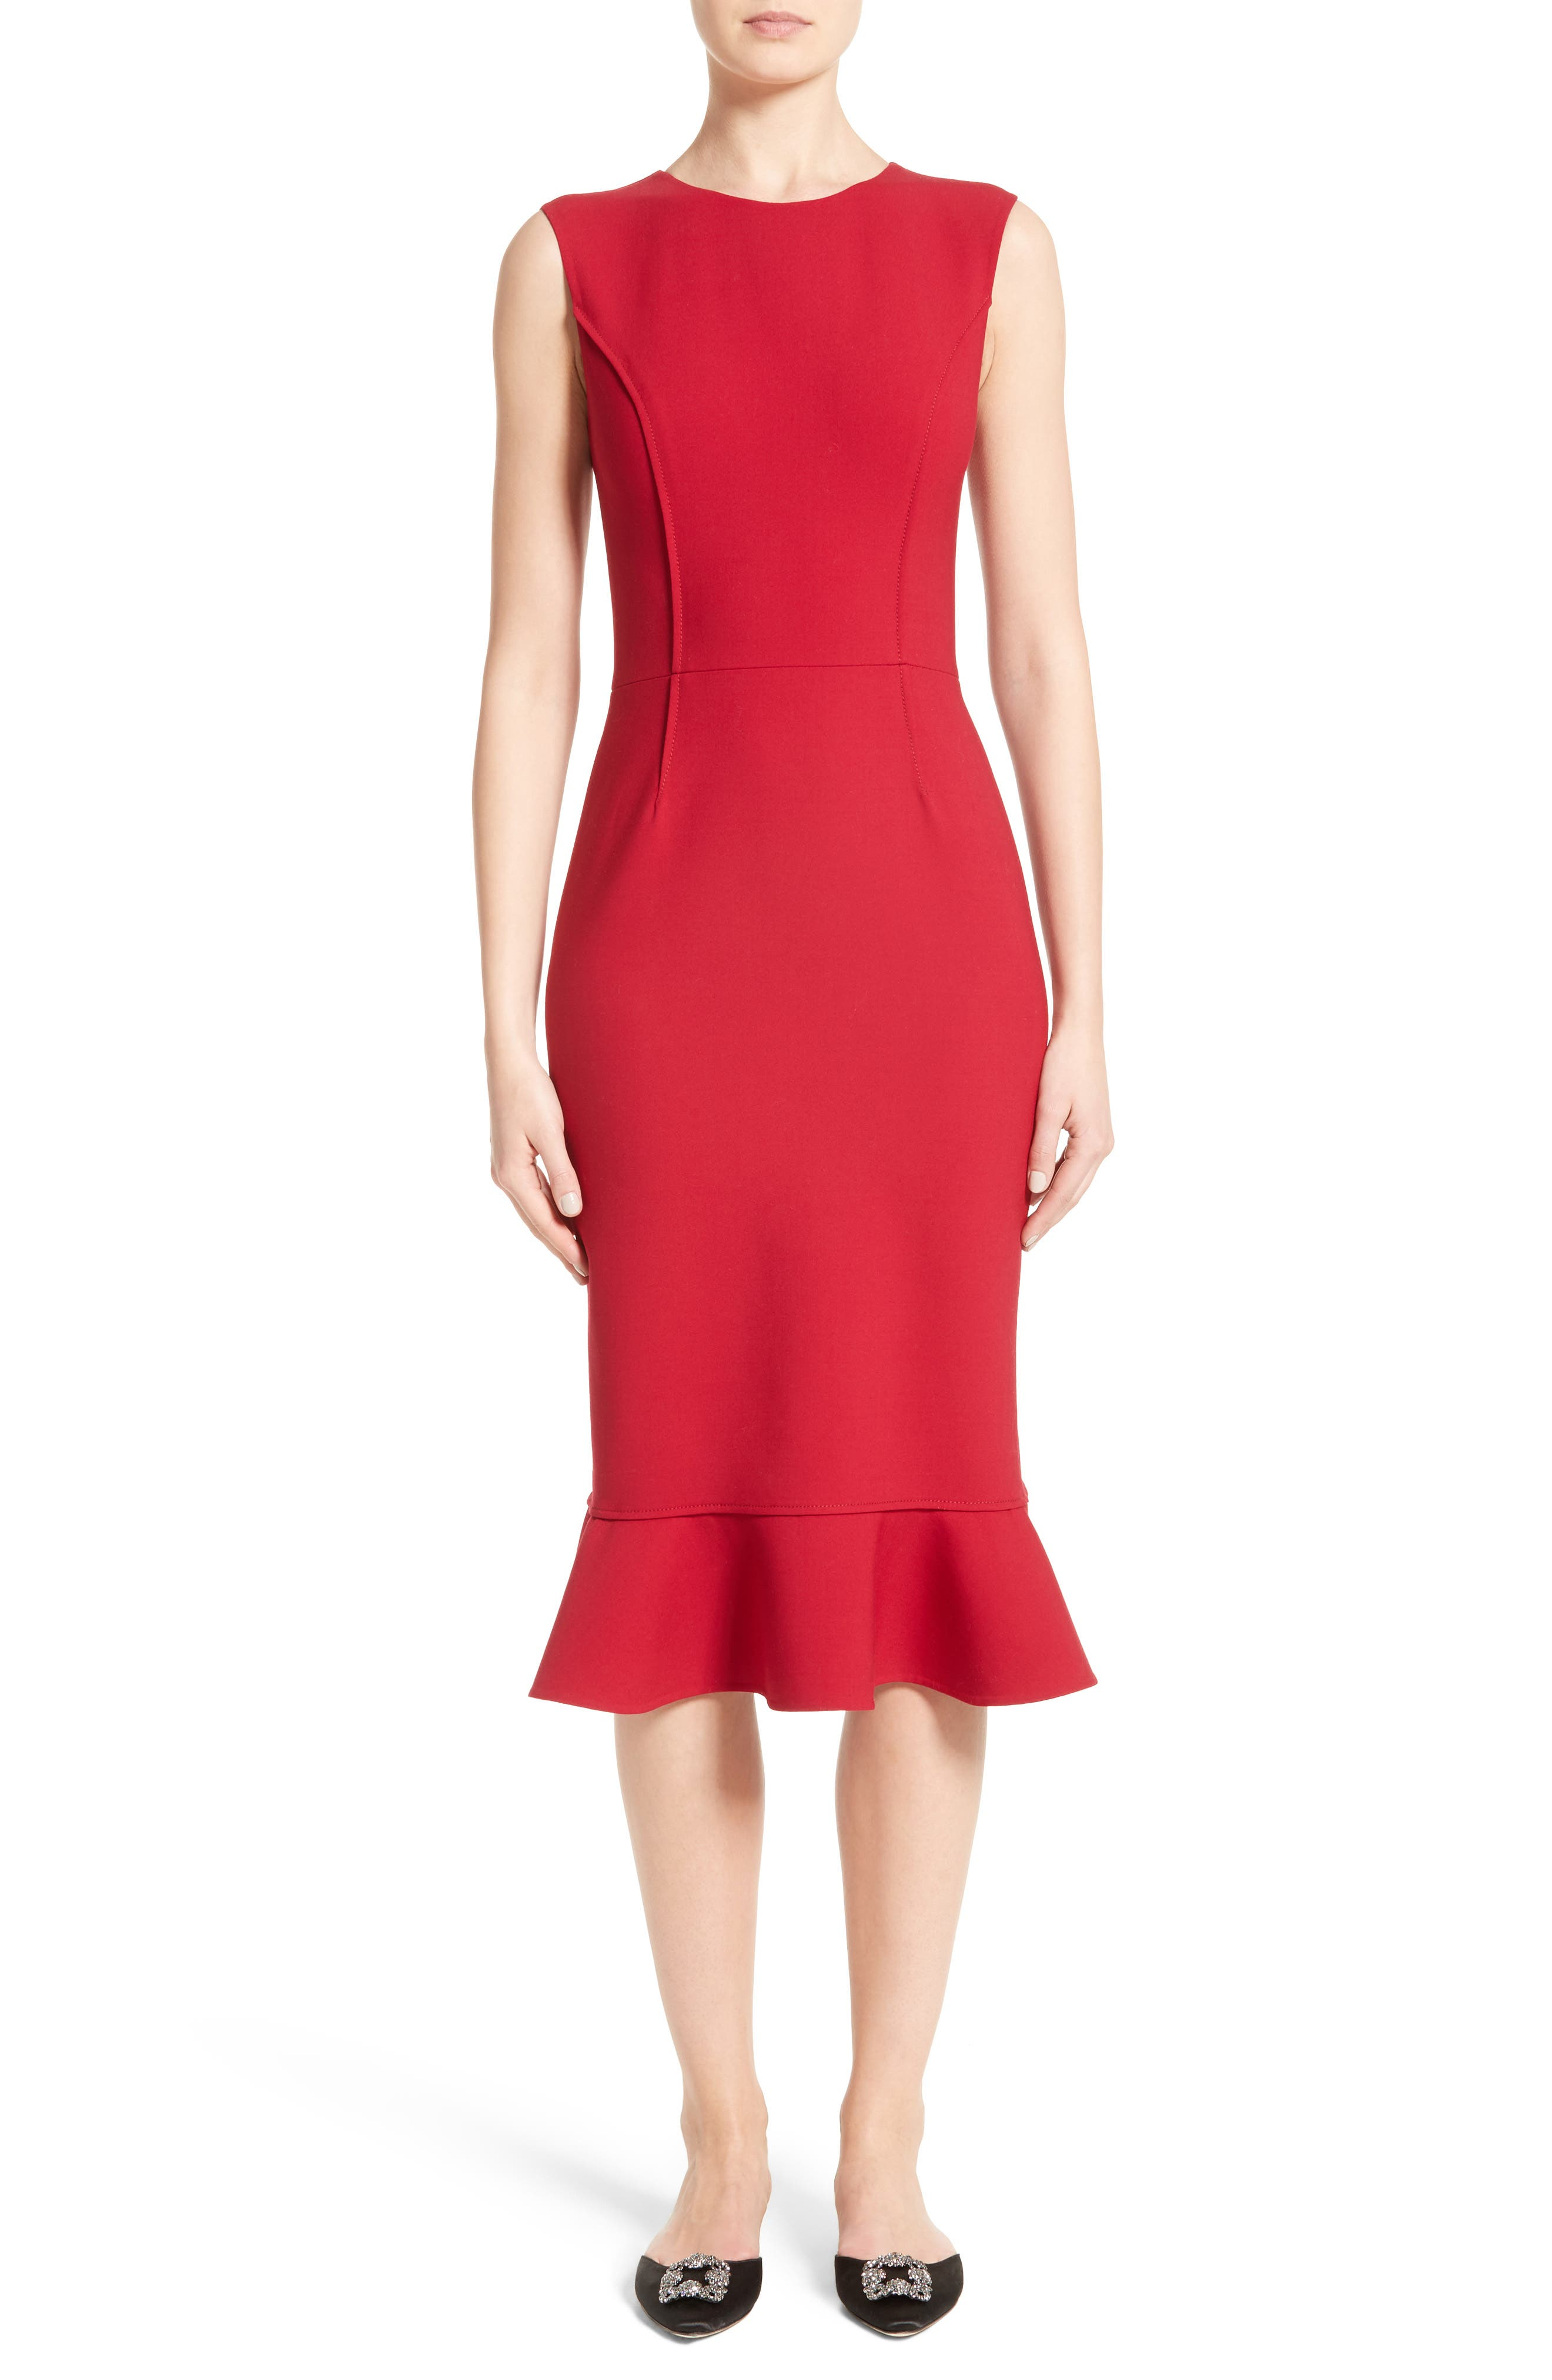 Main Image - Oscar de la Renta Stretch Crepe Sheath Dress